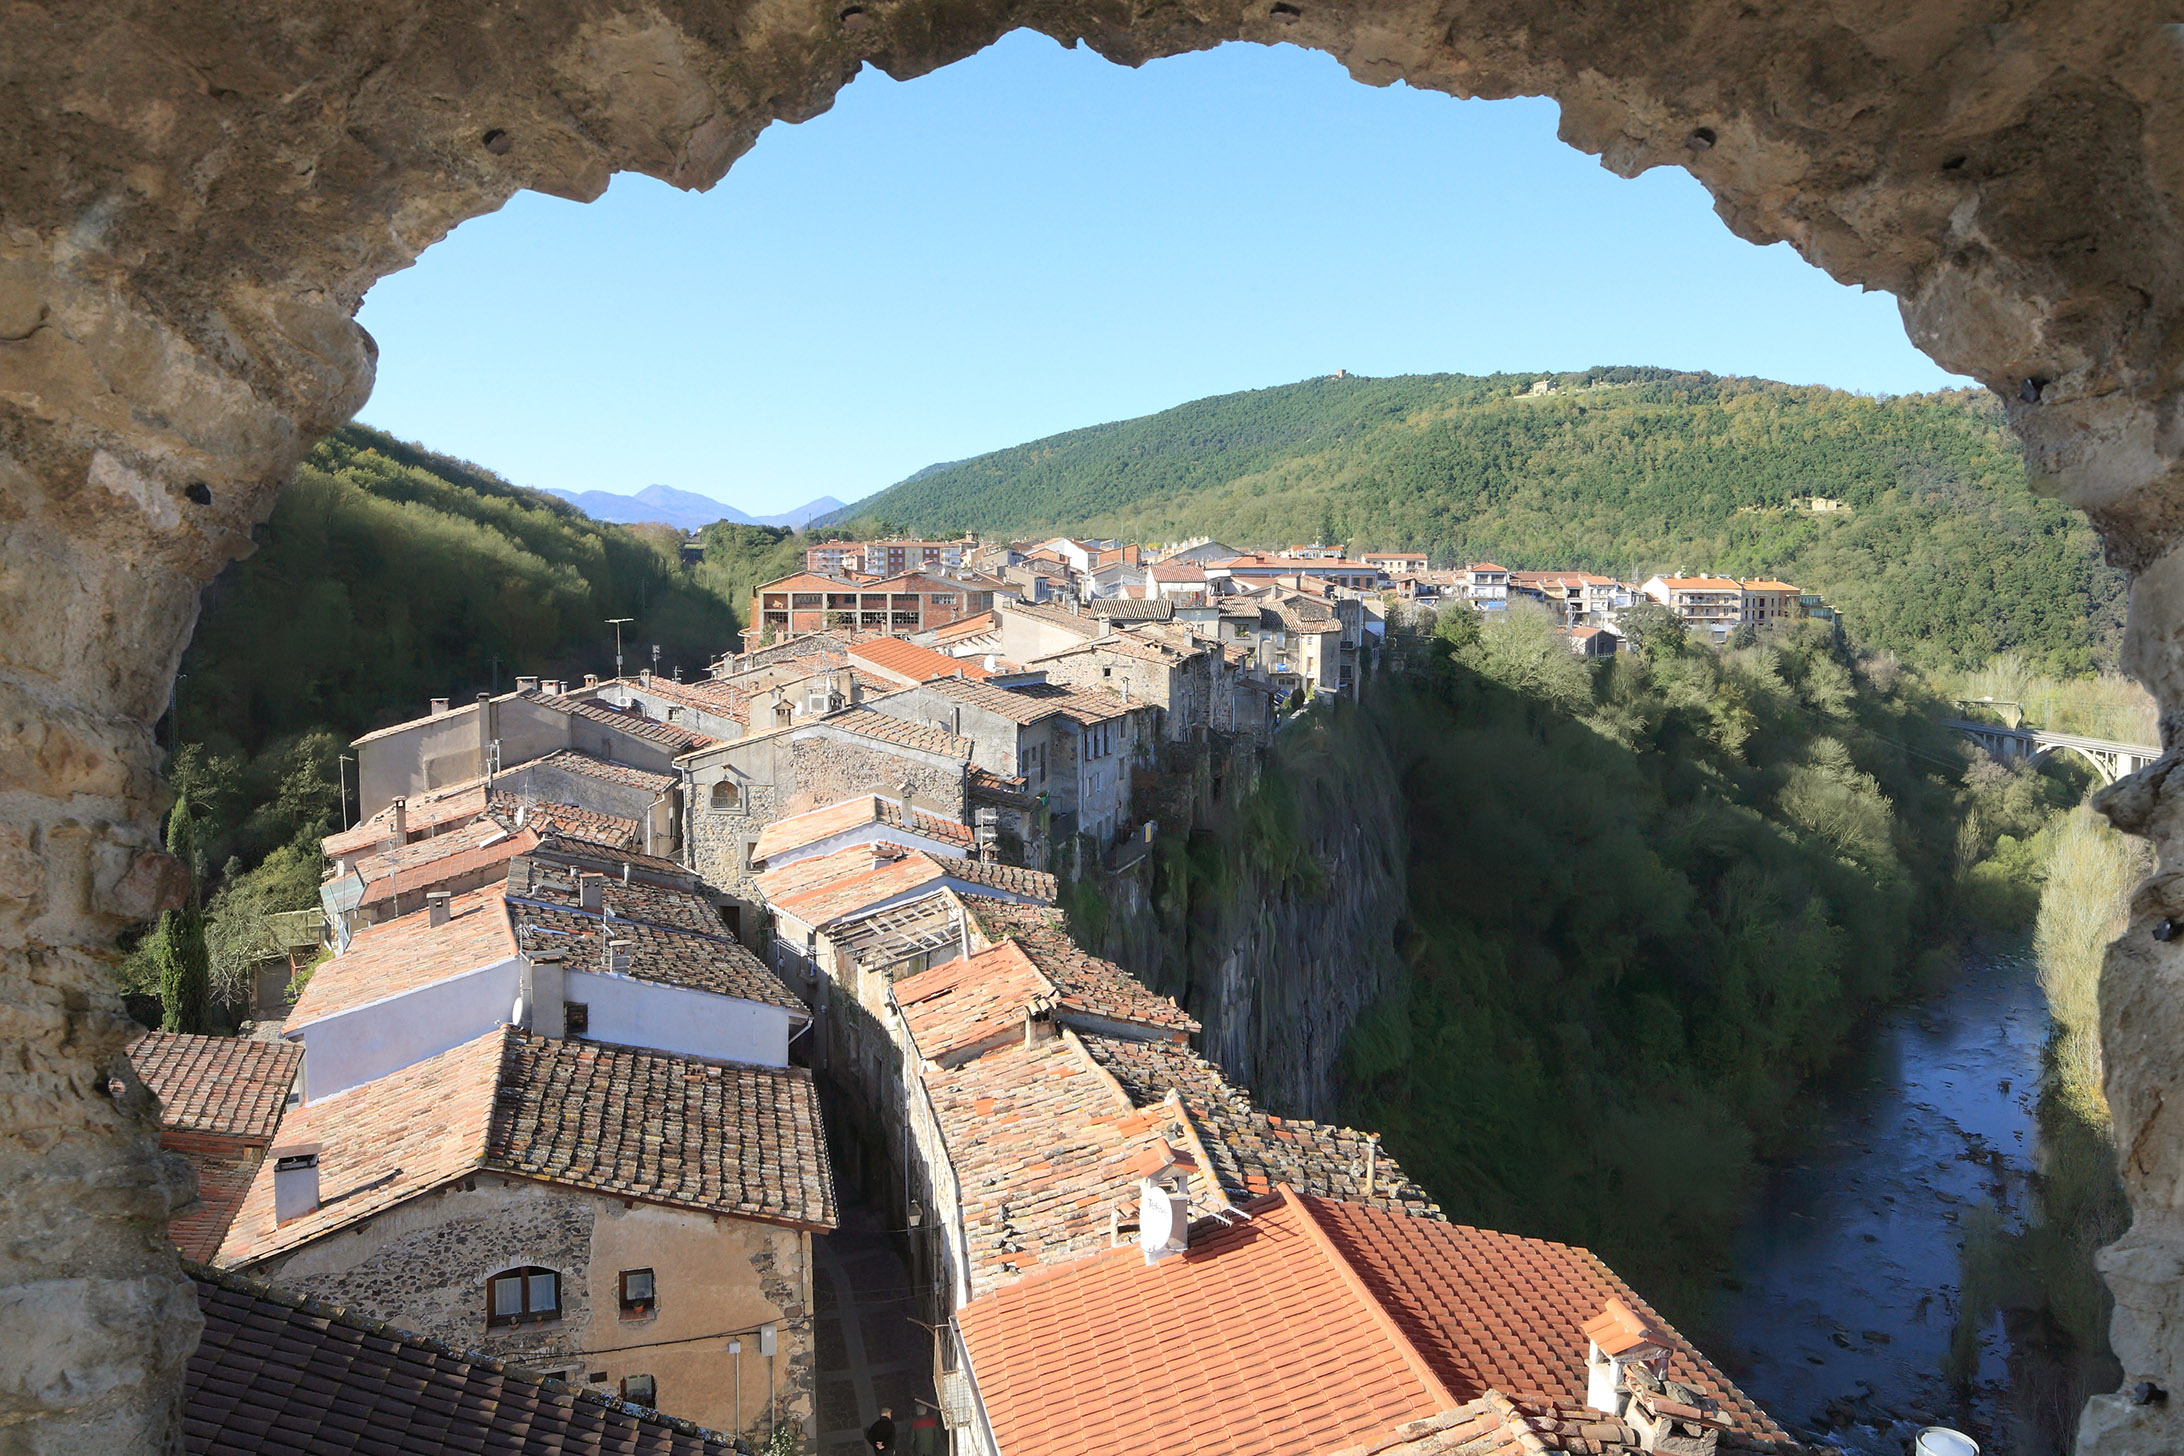 Esgar Viajes_Castellfolli de la Roca_2